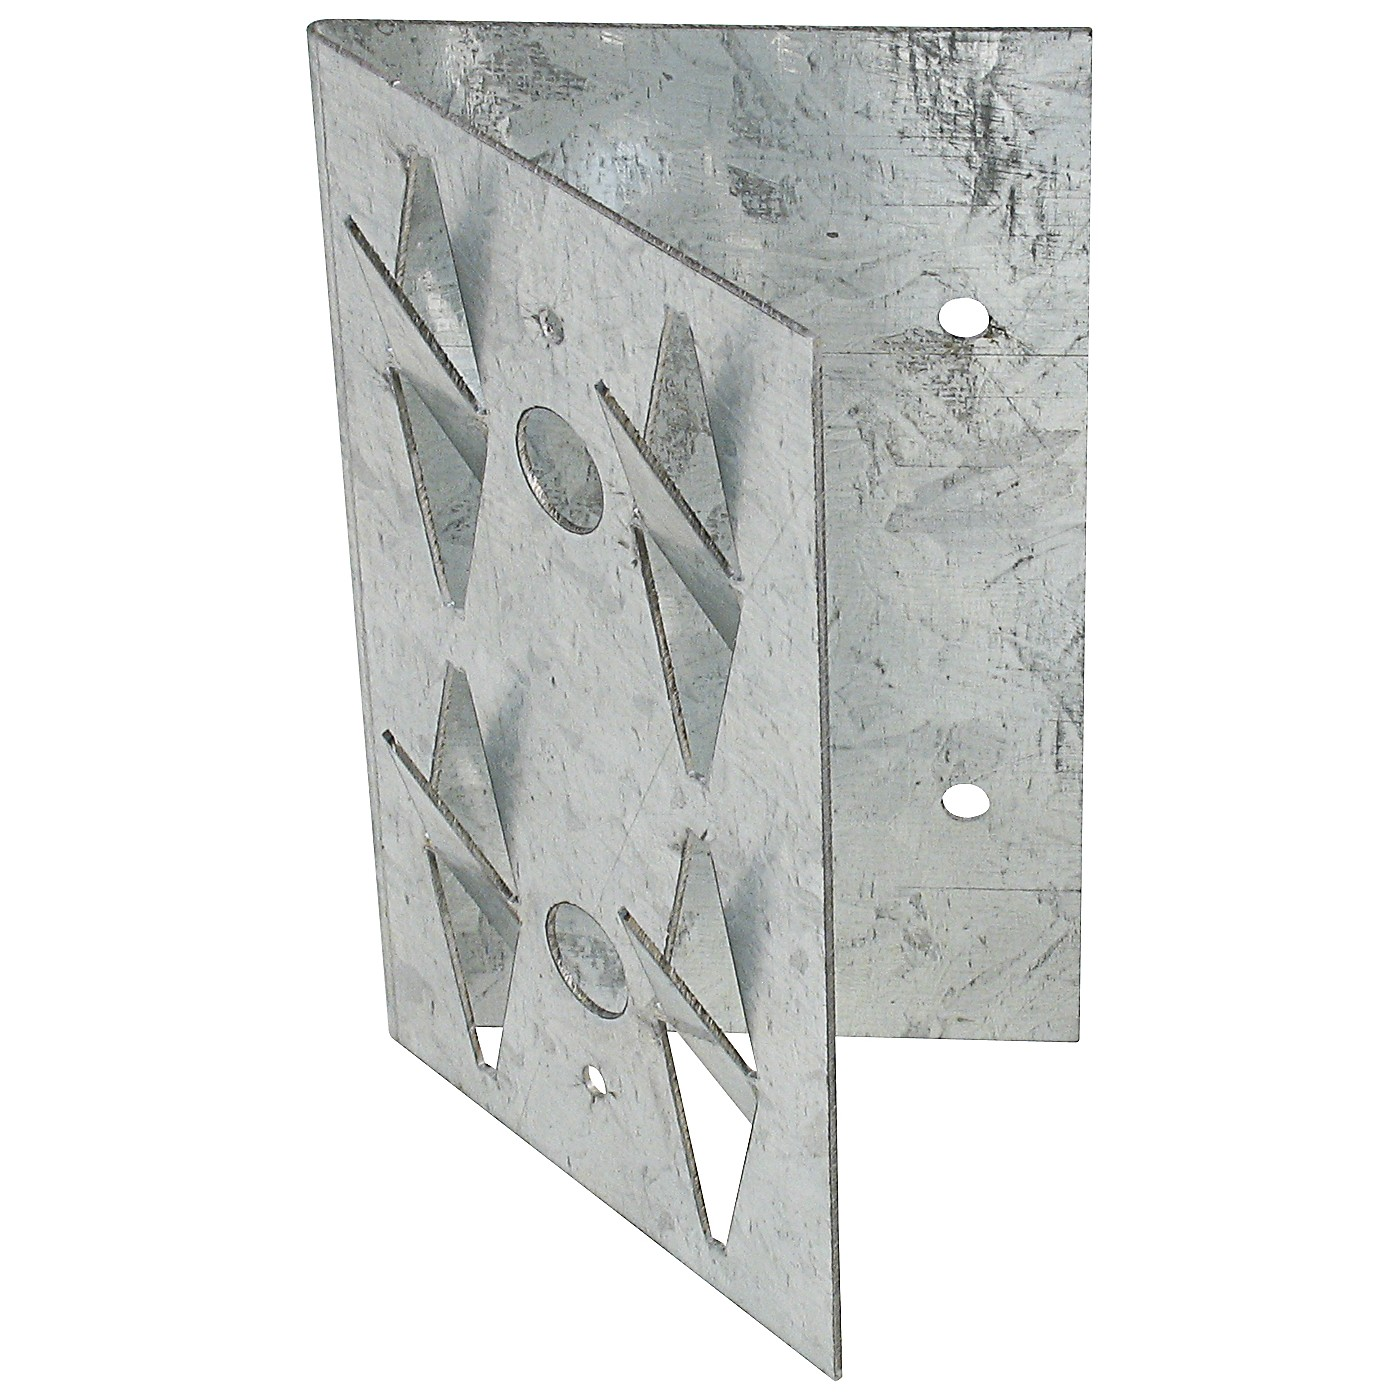 Primacoustic Corner Impaler for Mounting Broadway Acoustic Panels - 8 count thumbnail